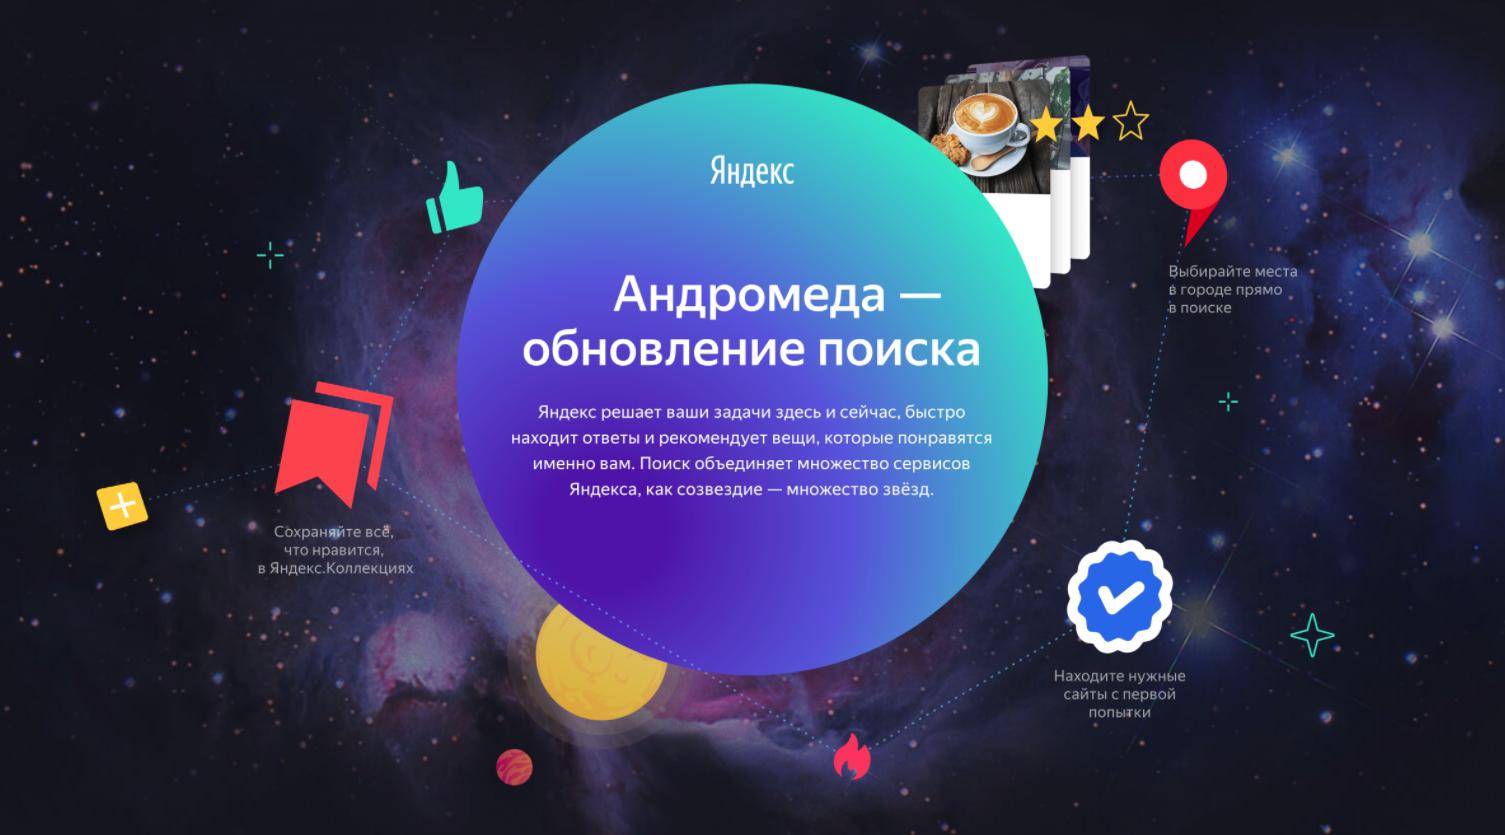 Яндекс представил масштабное обновление поиска «Андромеда»